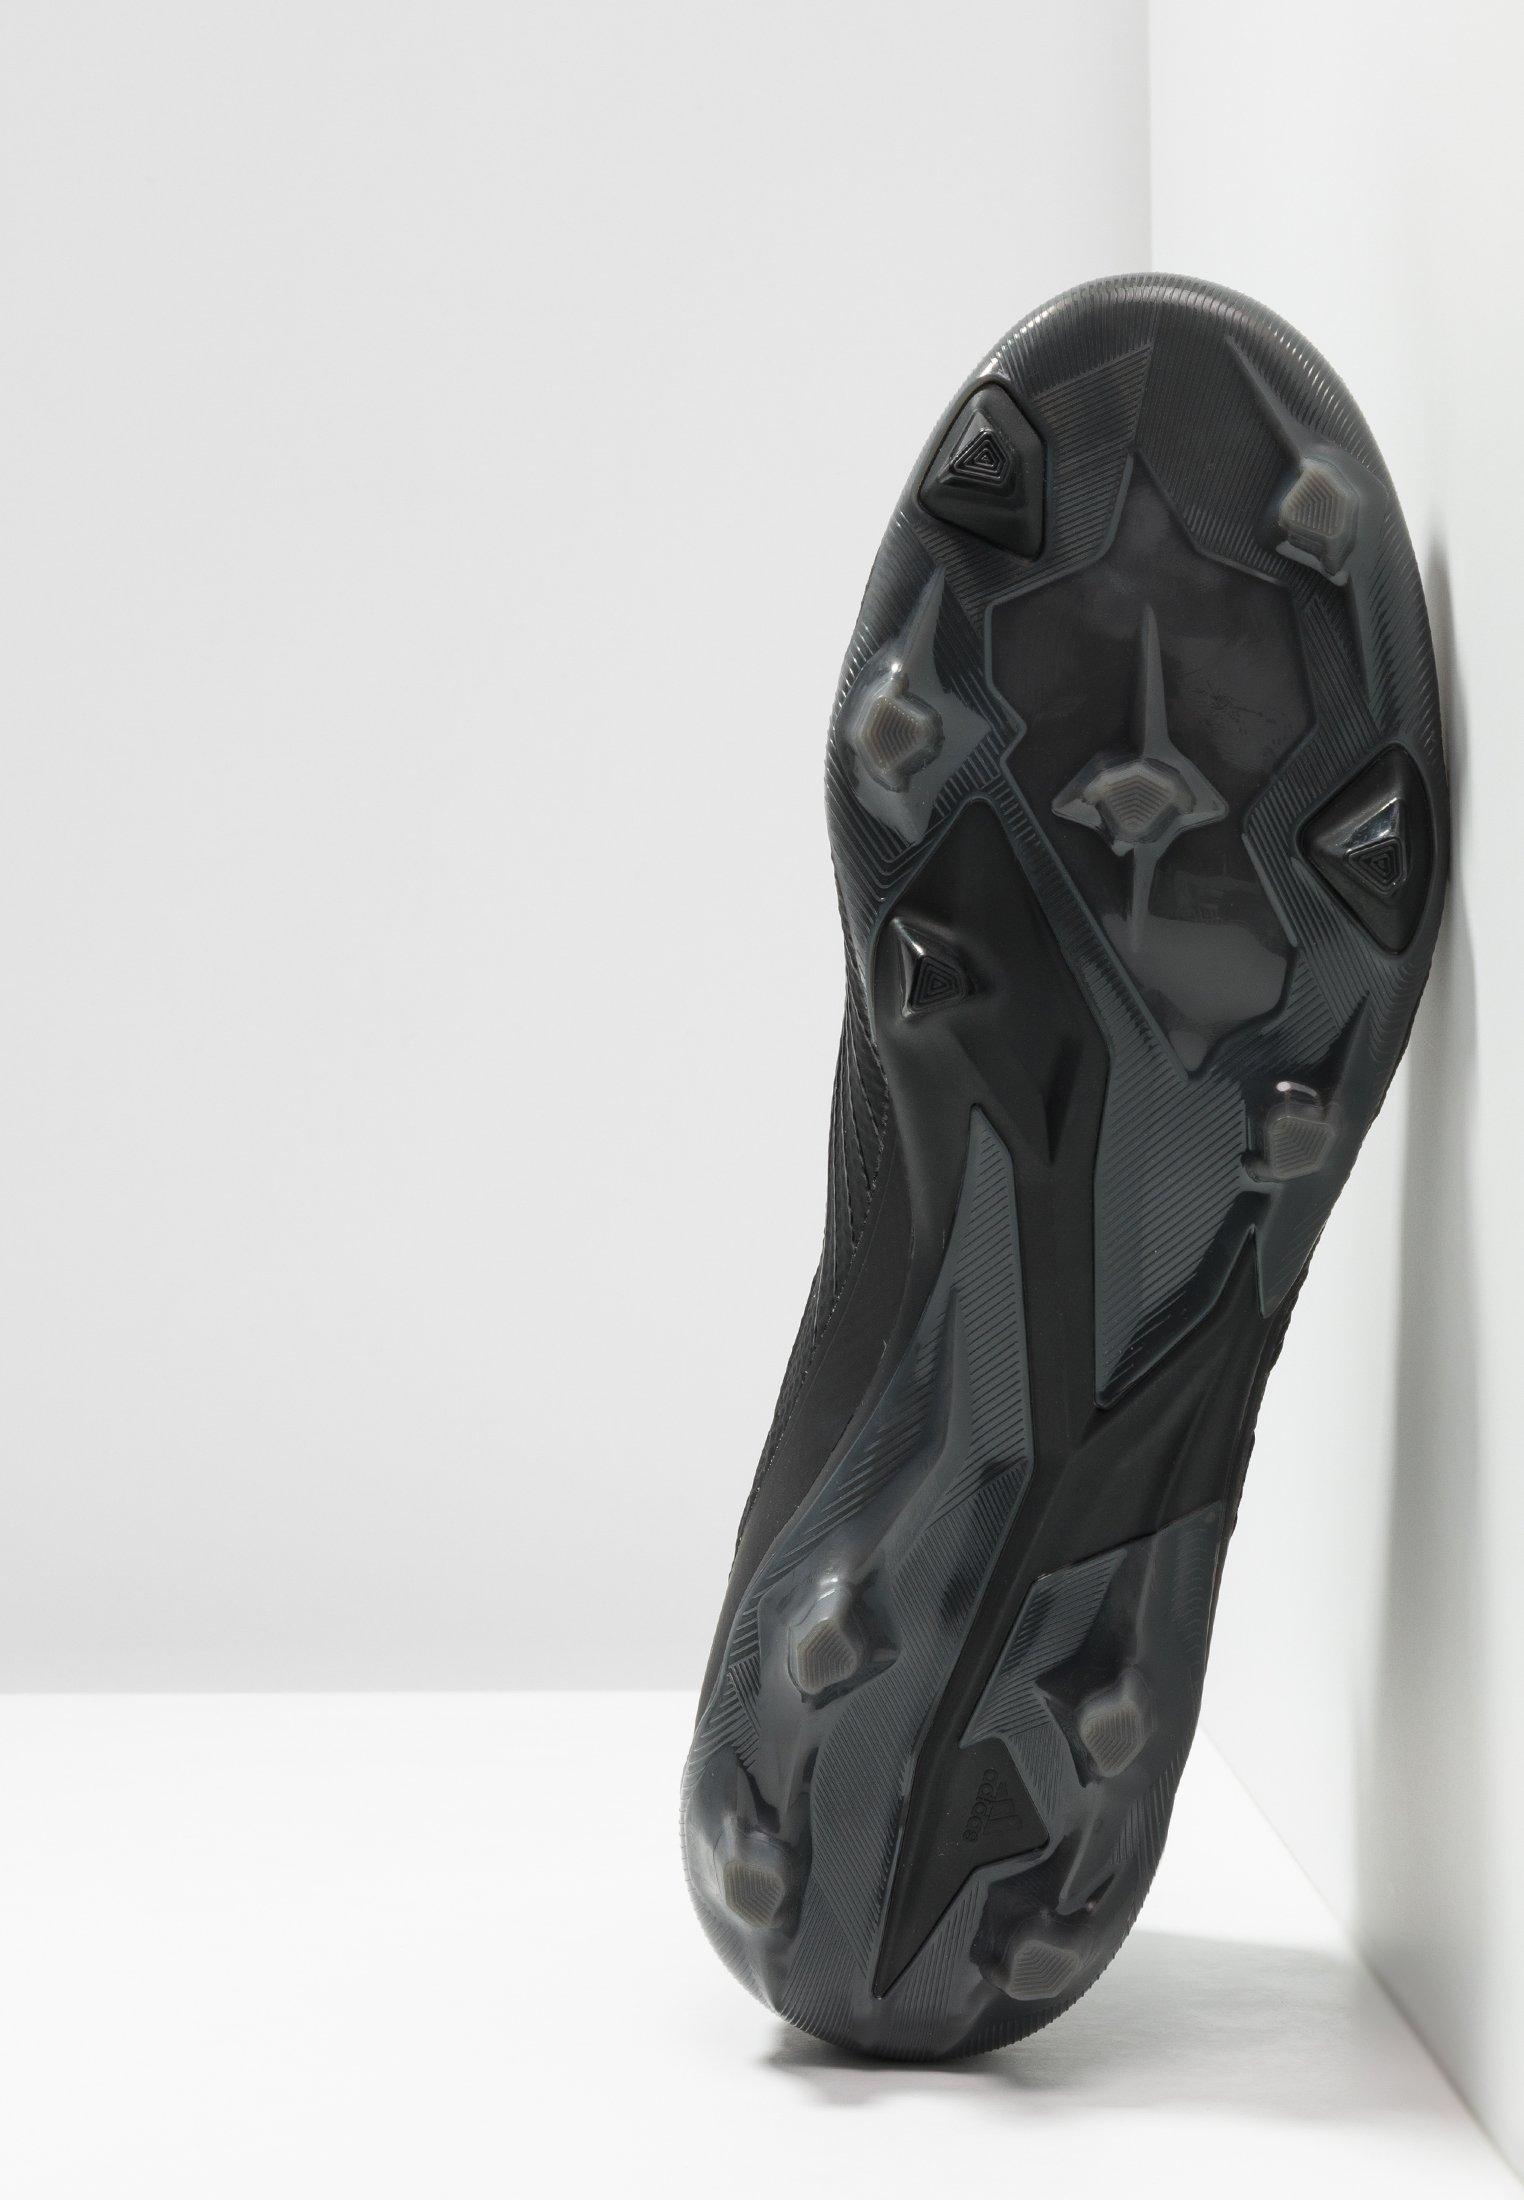 adidas Performance PREDATOR 19.2 FG - Fußballschuh Nocken - core black/utility black/schwarz - Herrenschuhe AQSbJ